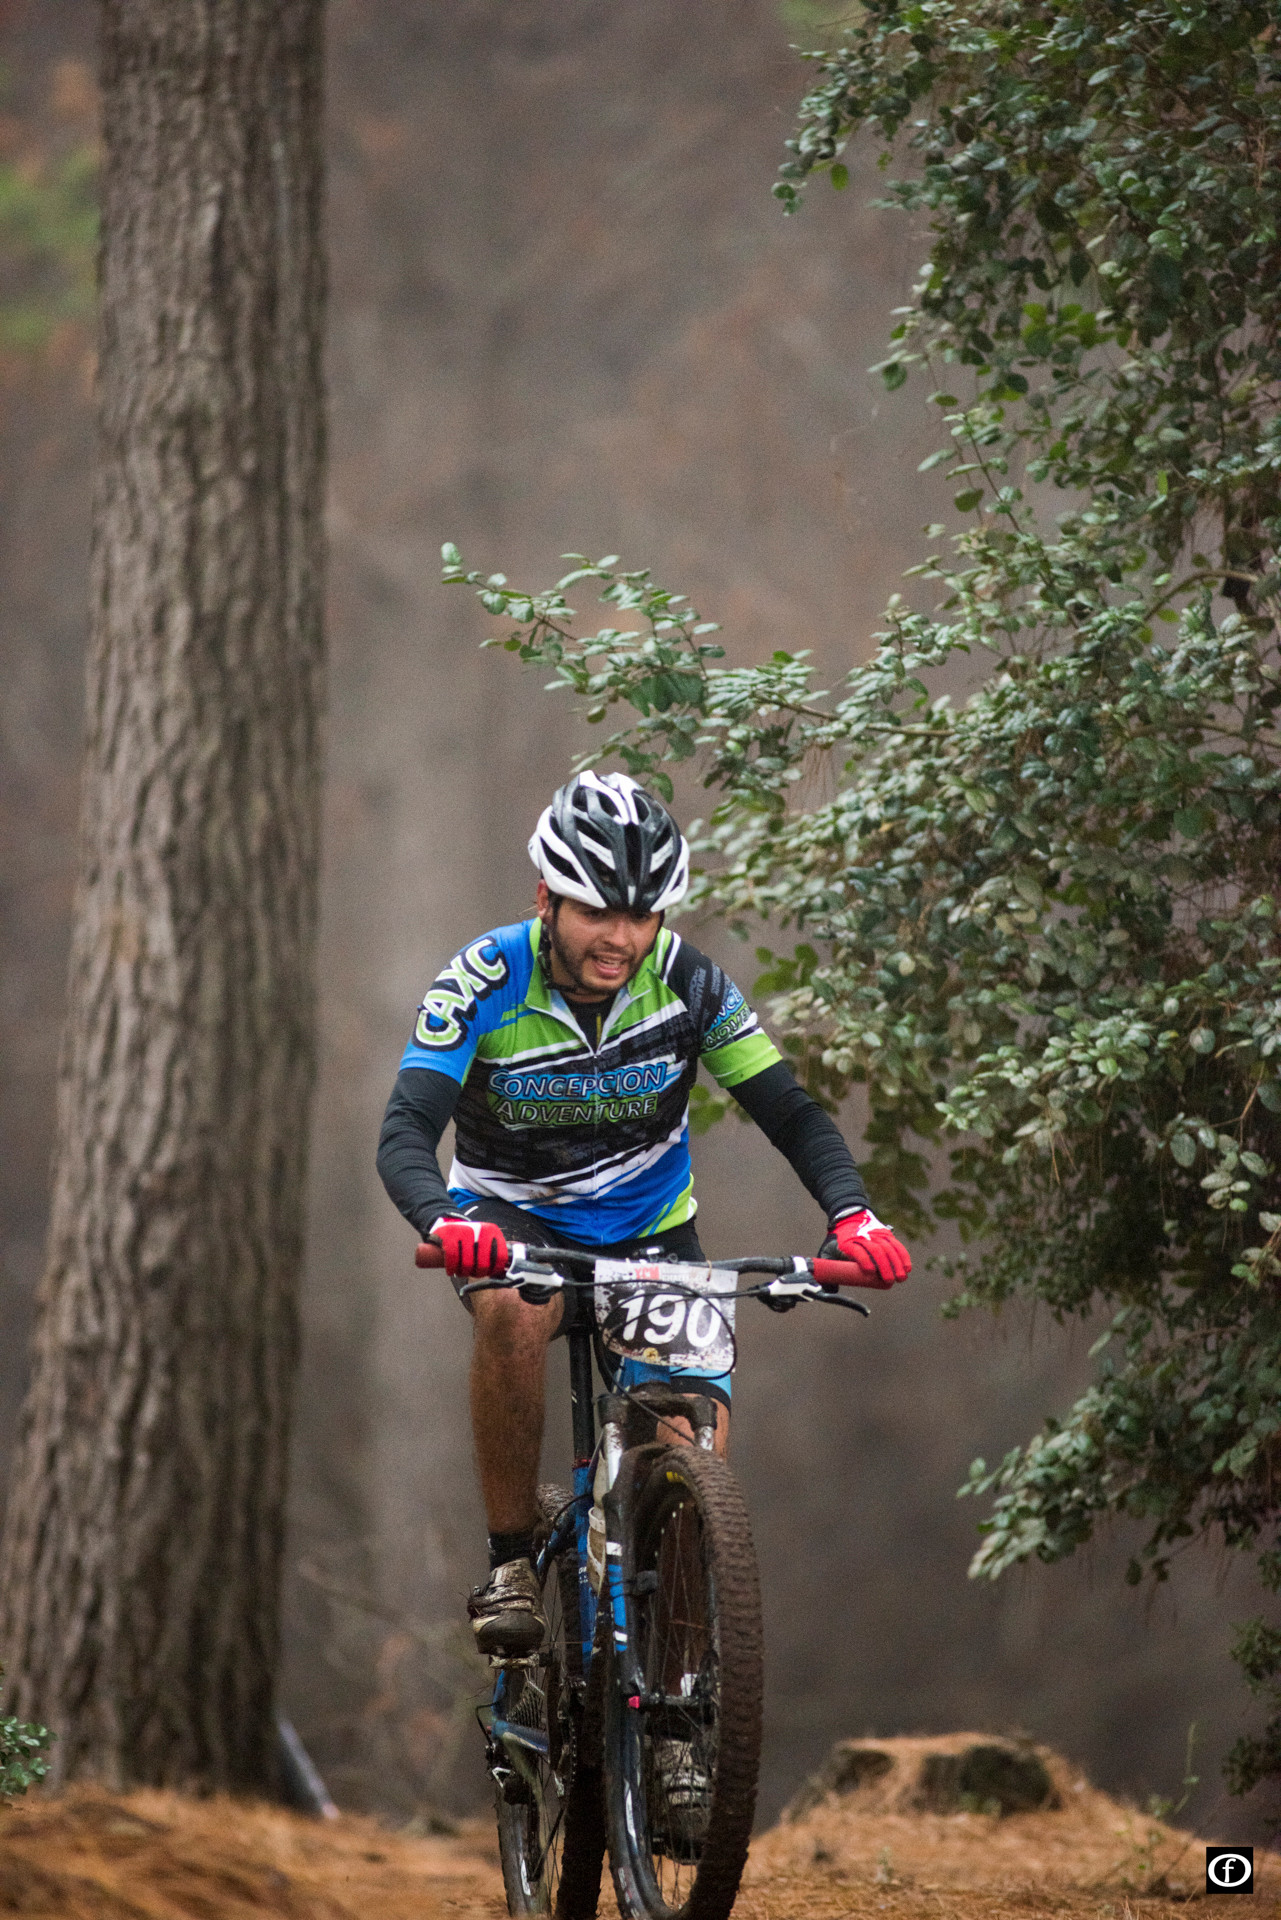 2015-05-17-Ciclismo Enduro-60.jpg